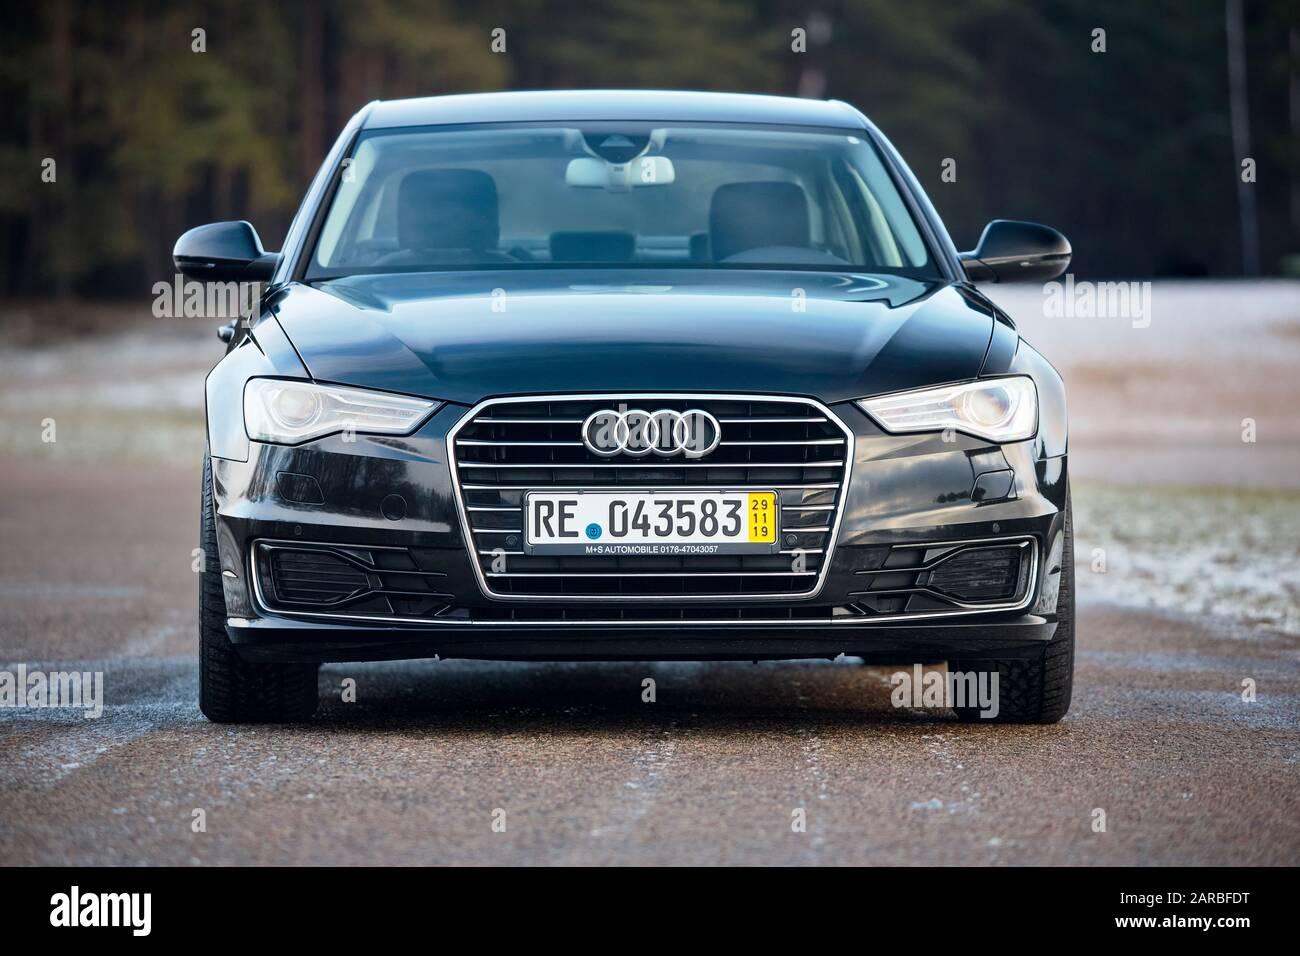 Kelebihan Audi 4G Murah Berkualitas